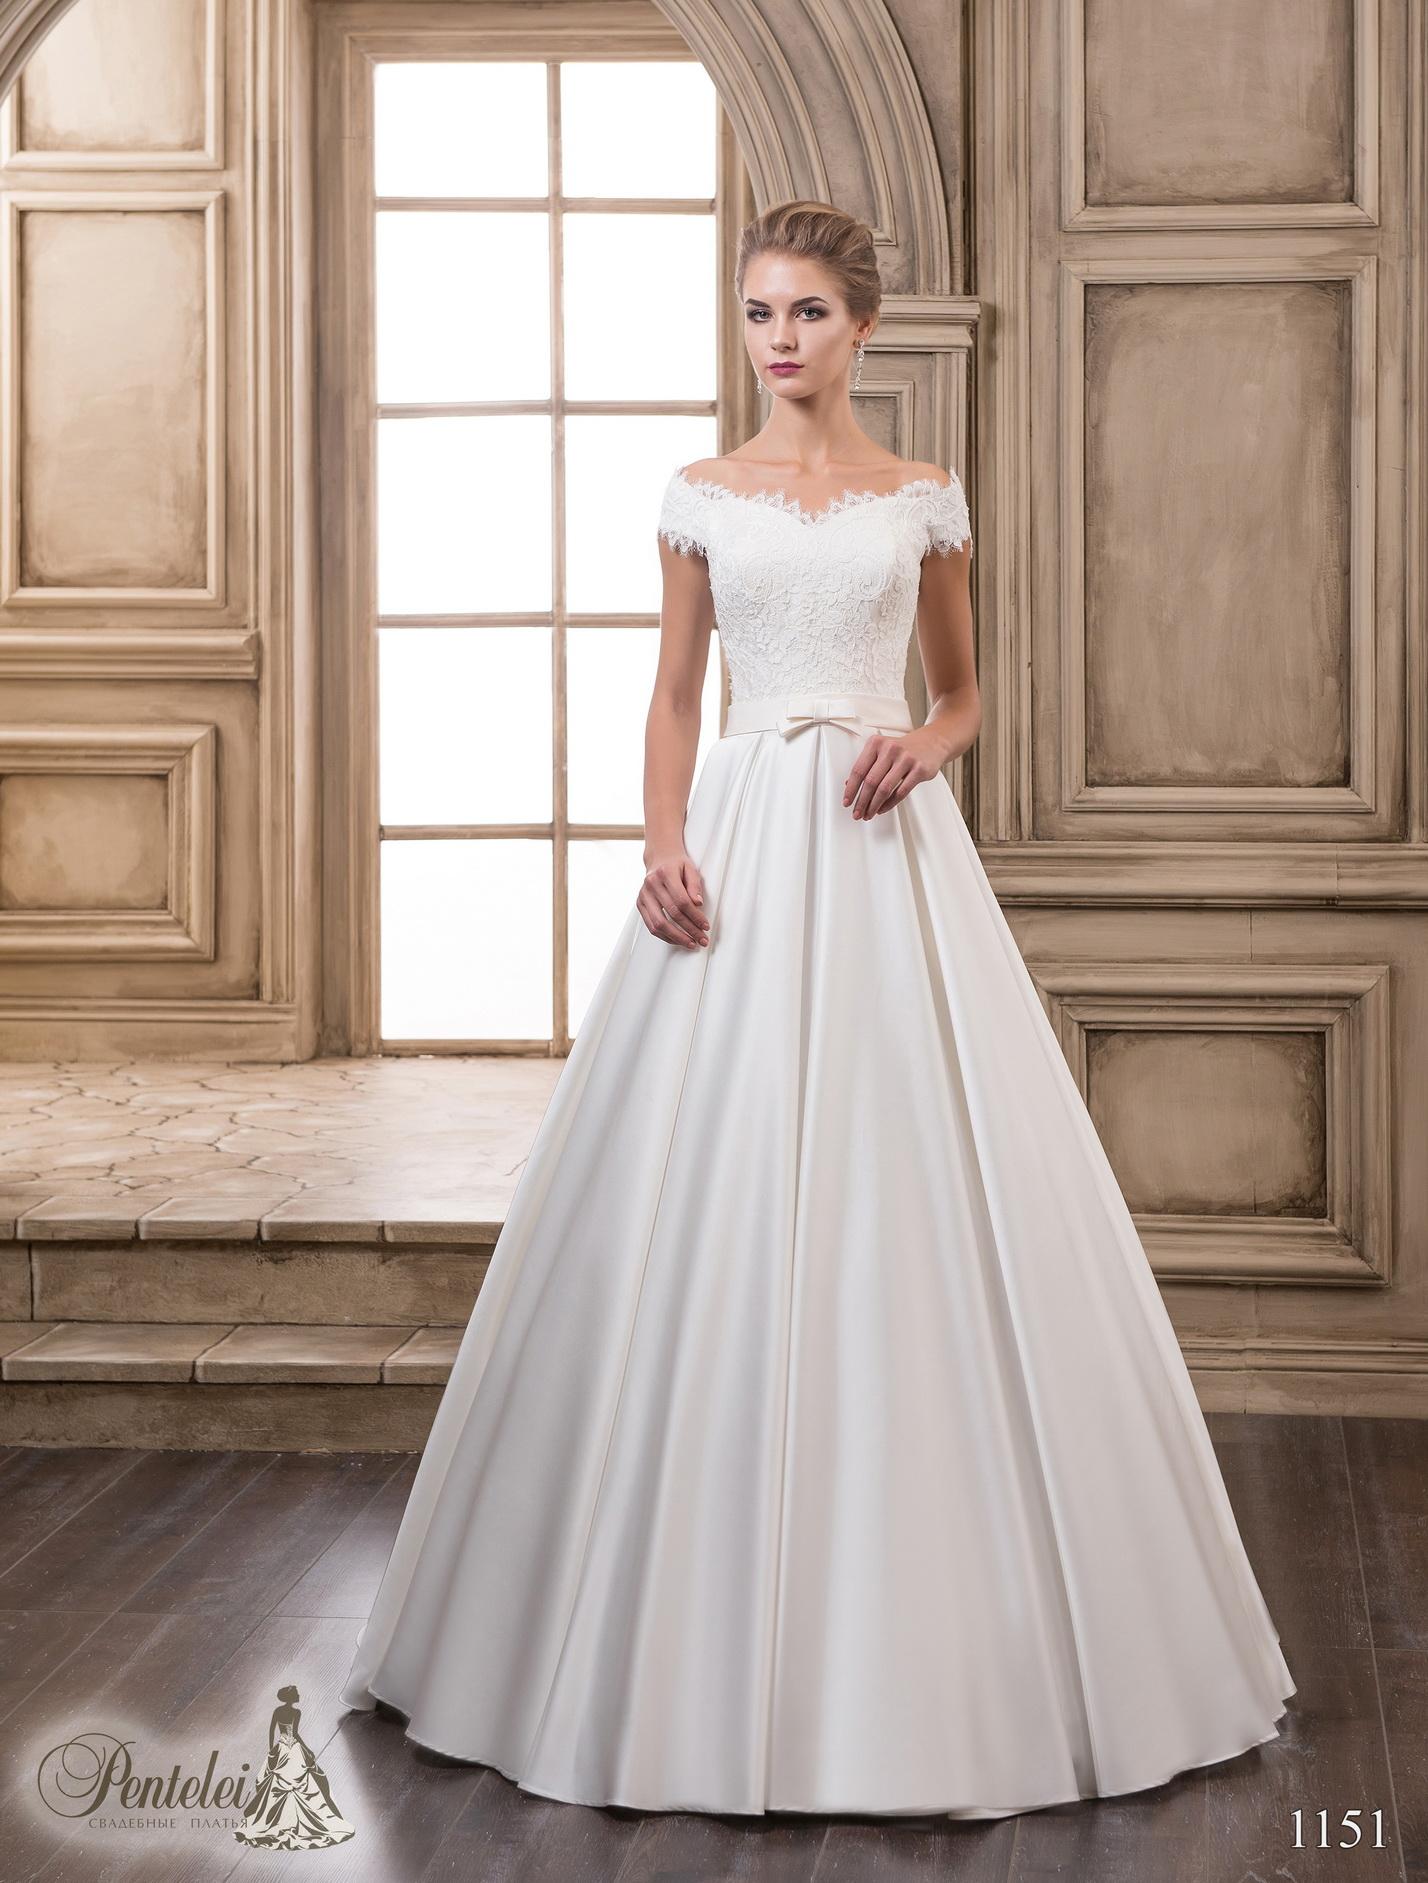 1151 | Buy wedding dresses wholesale from Pentelei